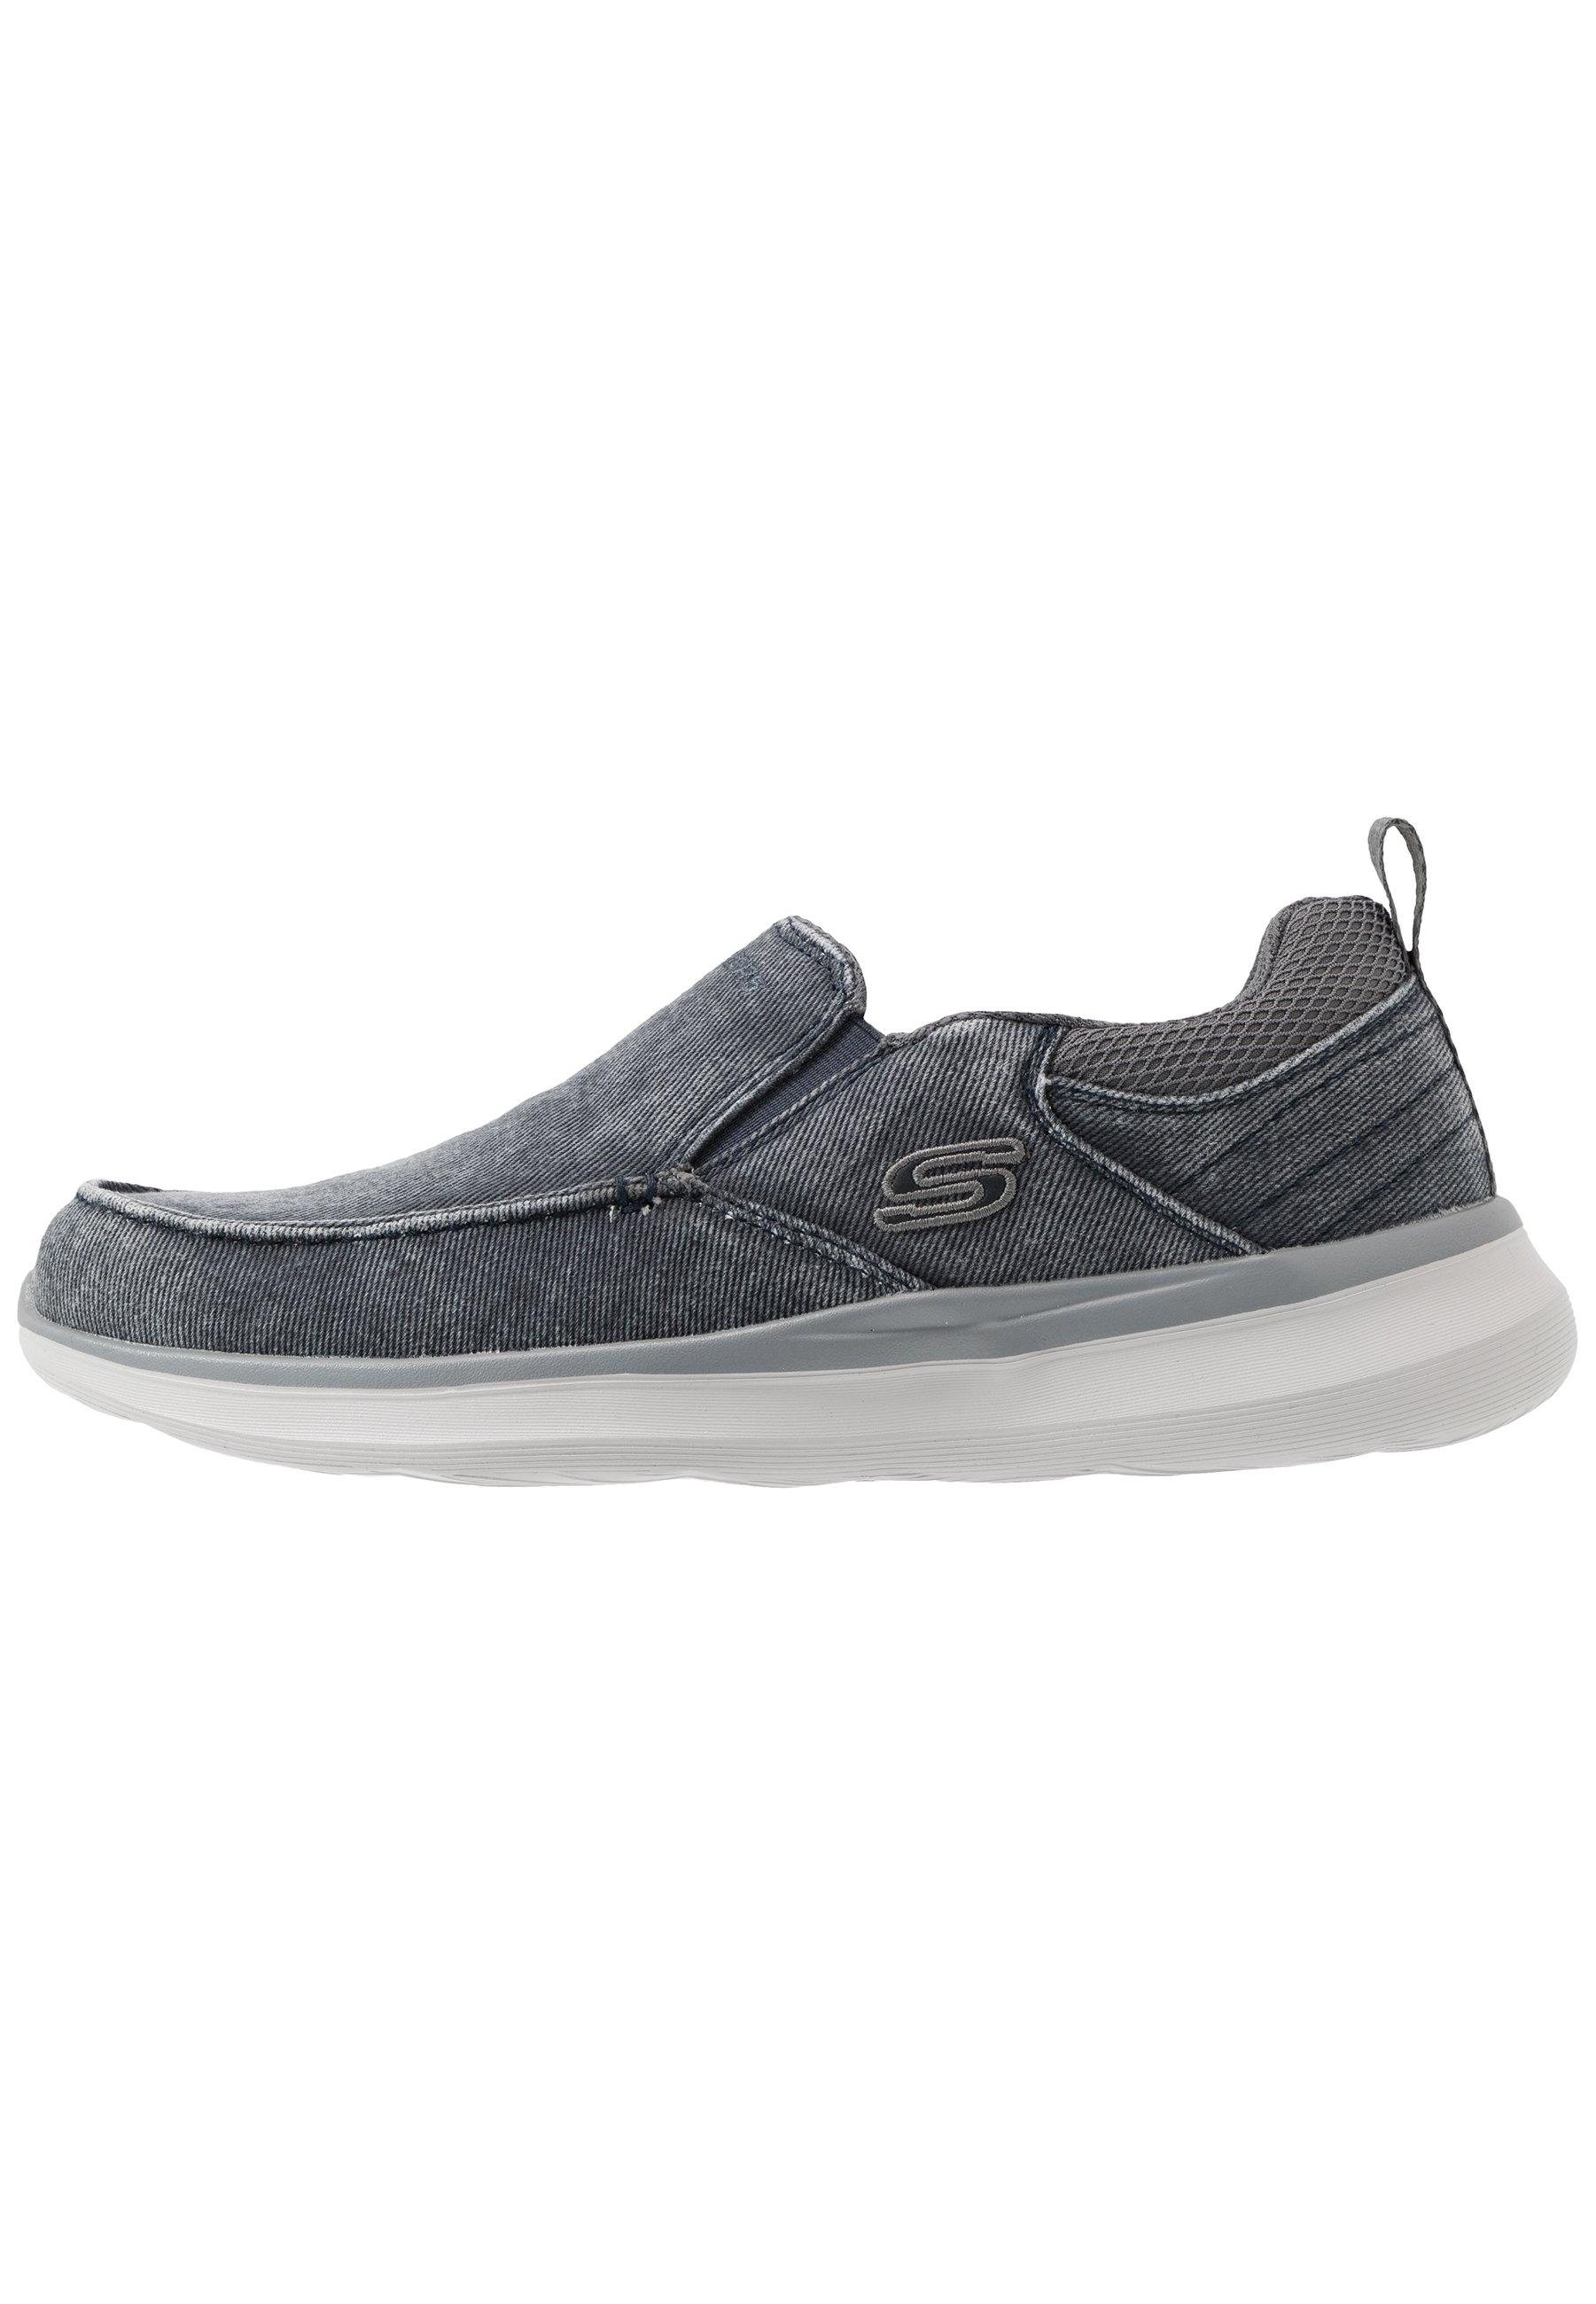 Skechers MORENO Sneakers basse navy Zalando.it